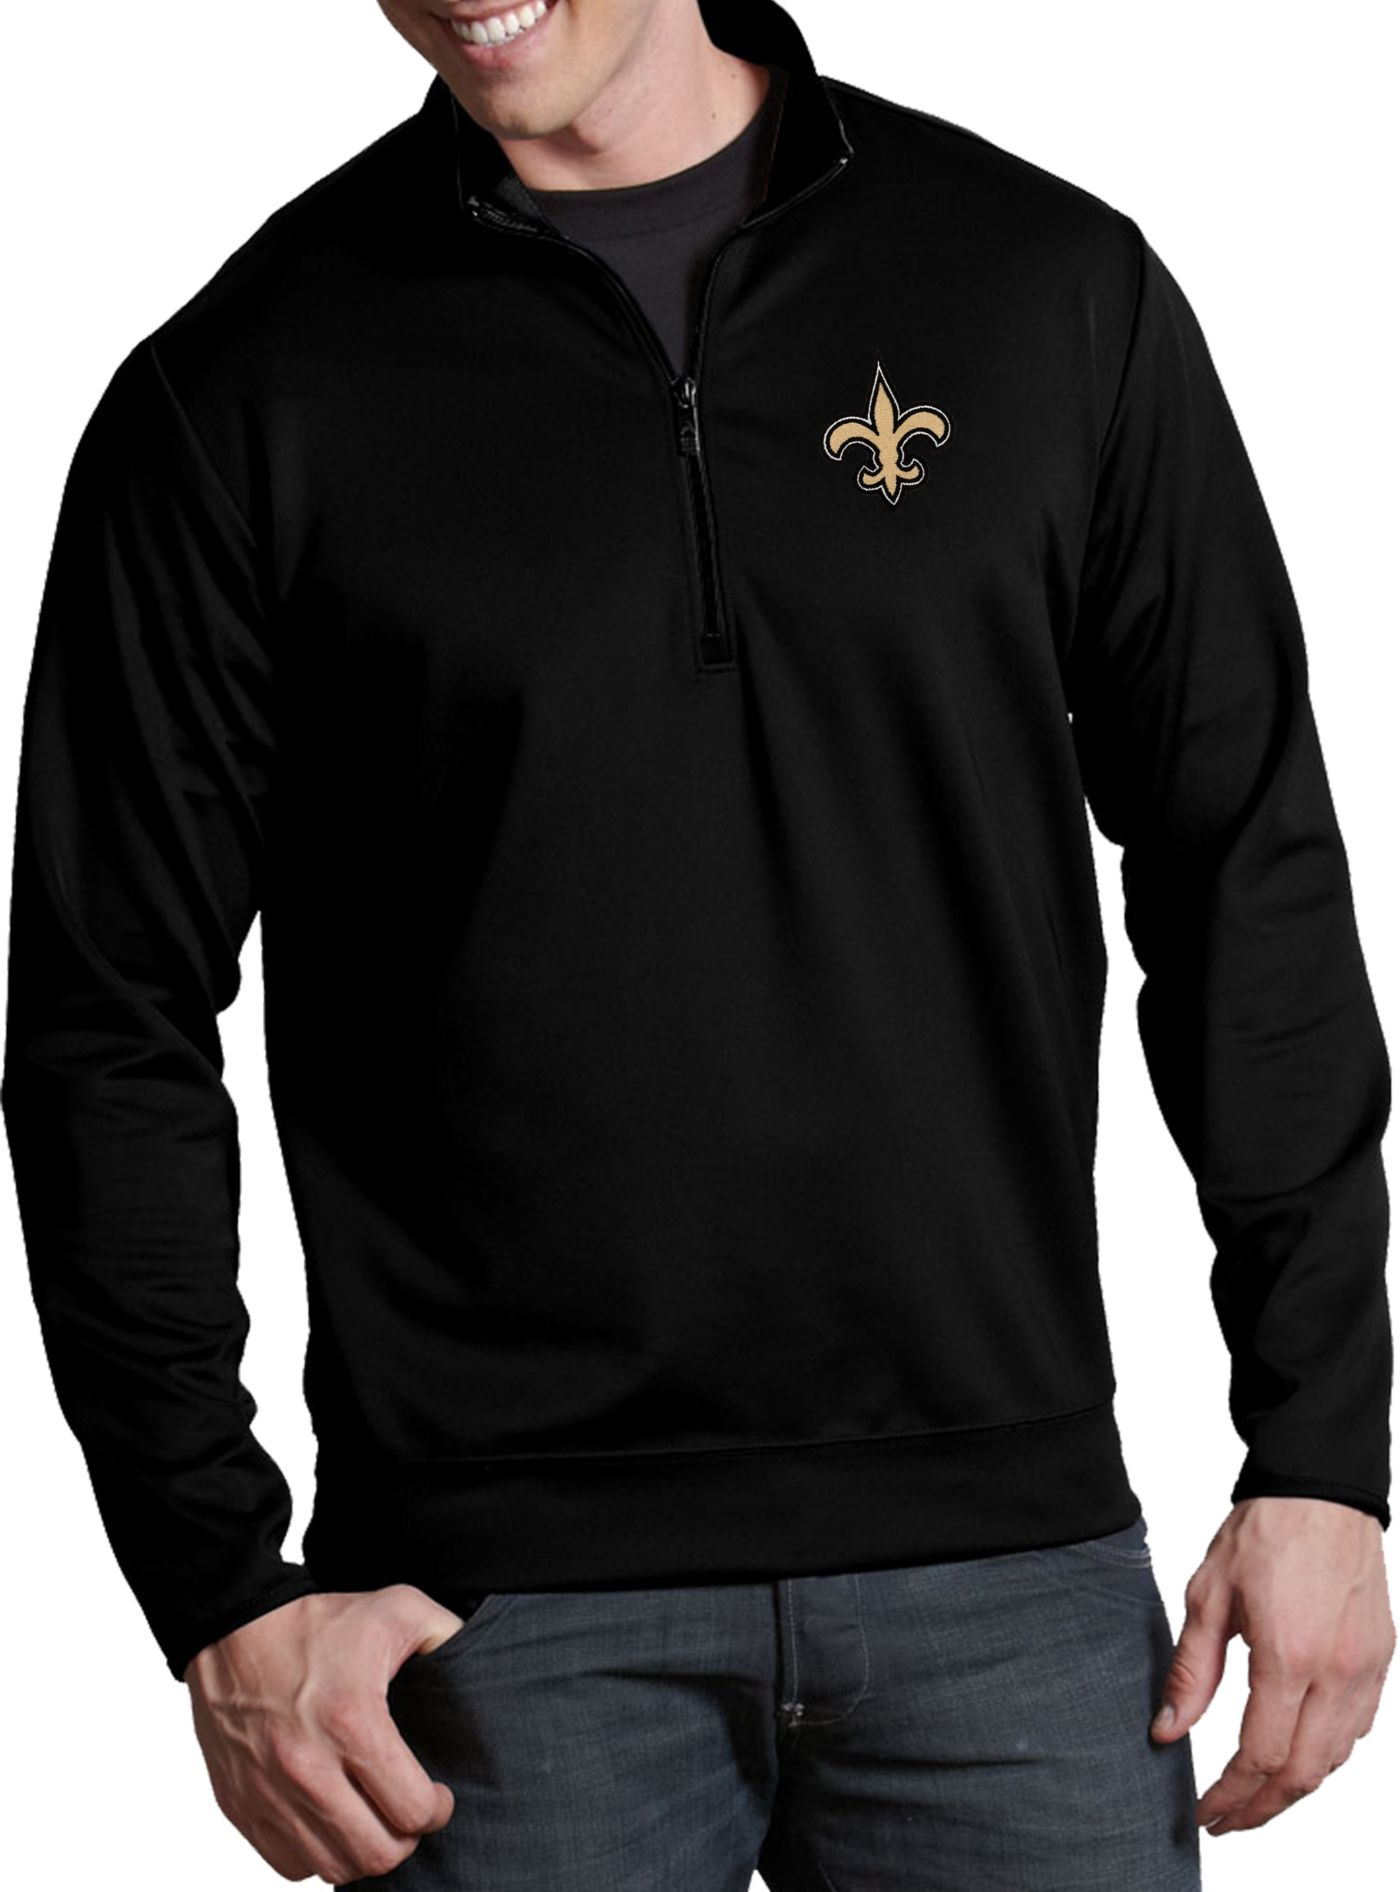 Antigua Men's New Orleans Saints Leader Quarter-Zip Black Pullover Top